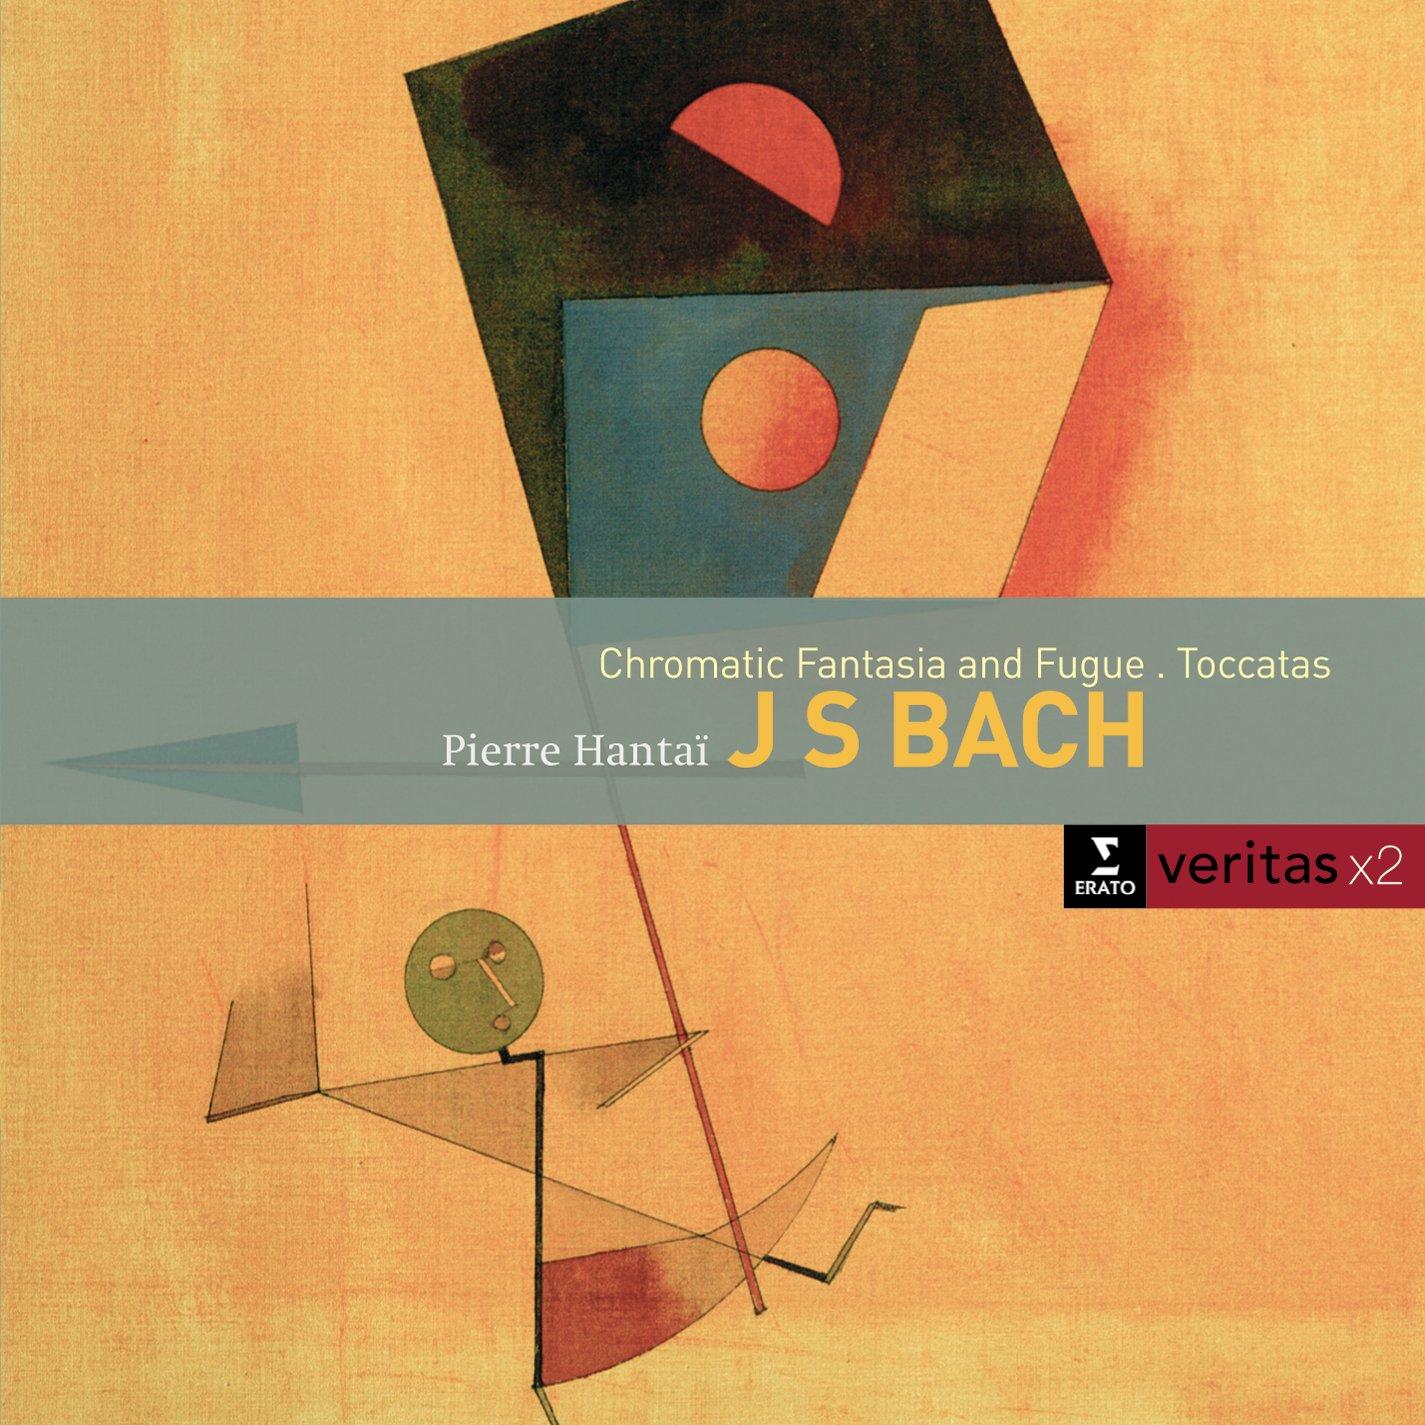 J.S Bach - Toccatas 81%2B6qoboCYL._SL1425_